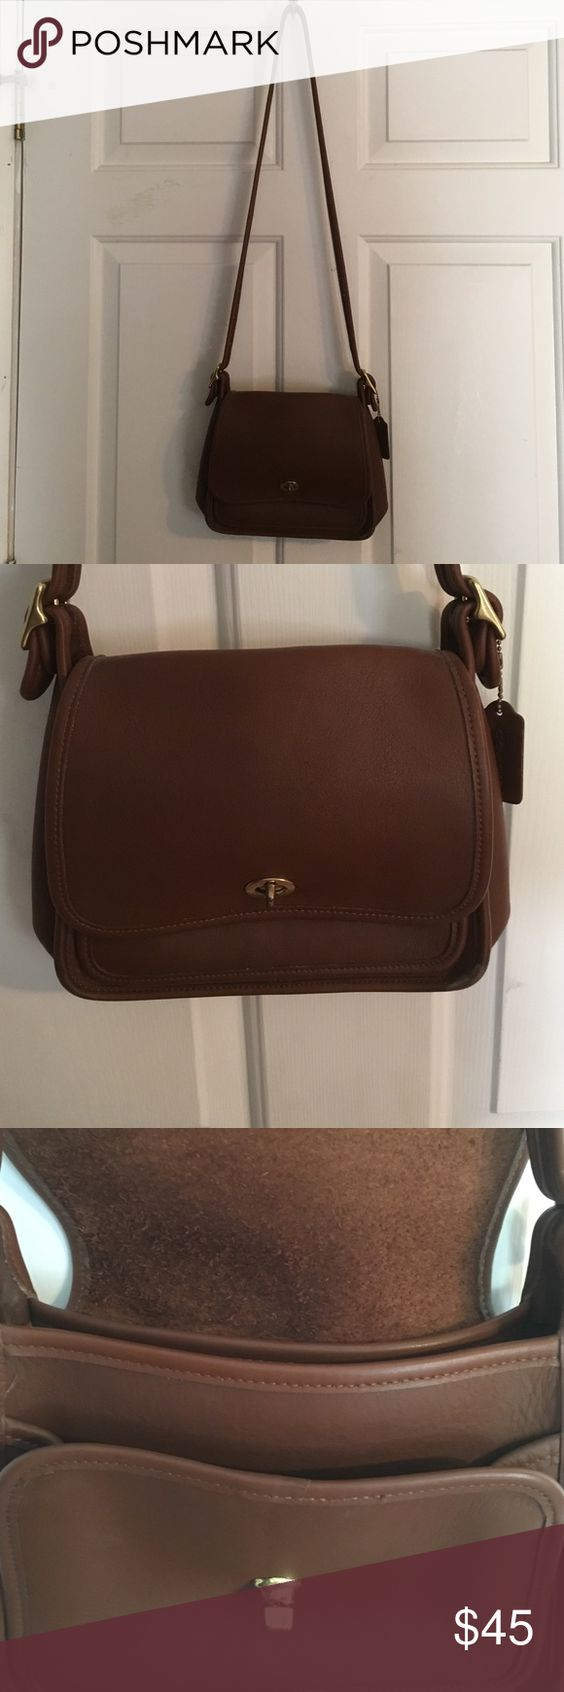 Coach purse Tan vintage coach purse. EUC!! Only used a few times. Coach Bags Shoulder Bags